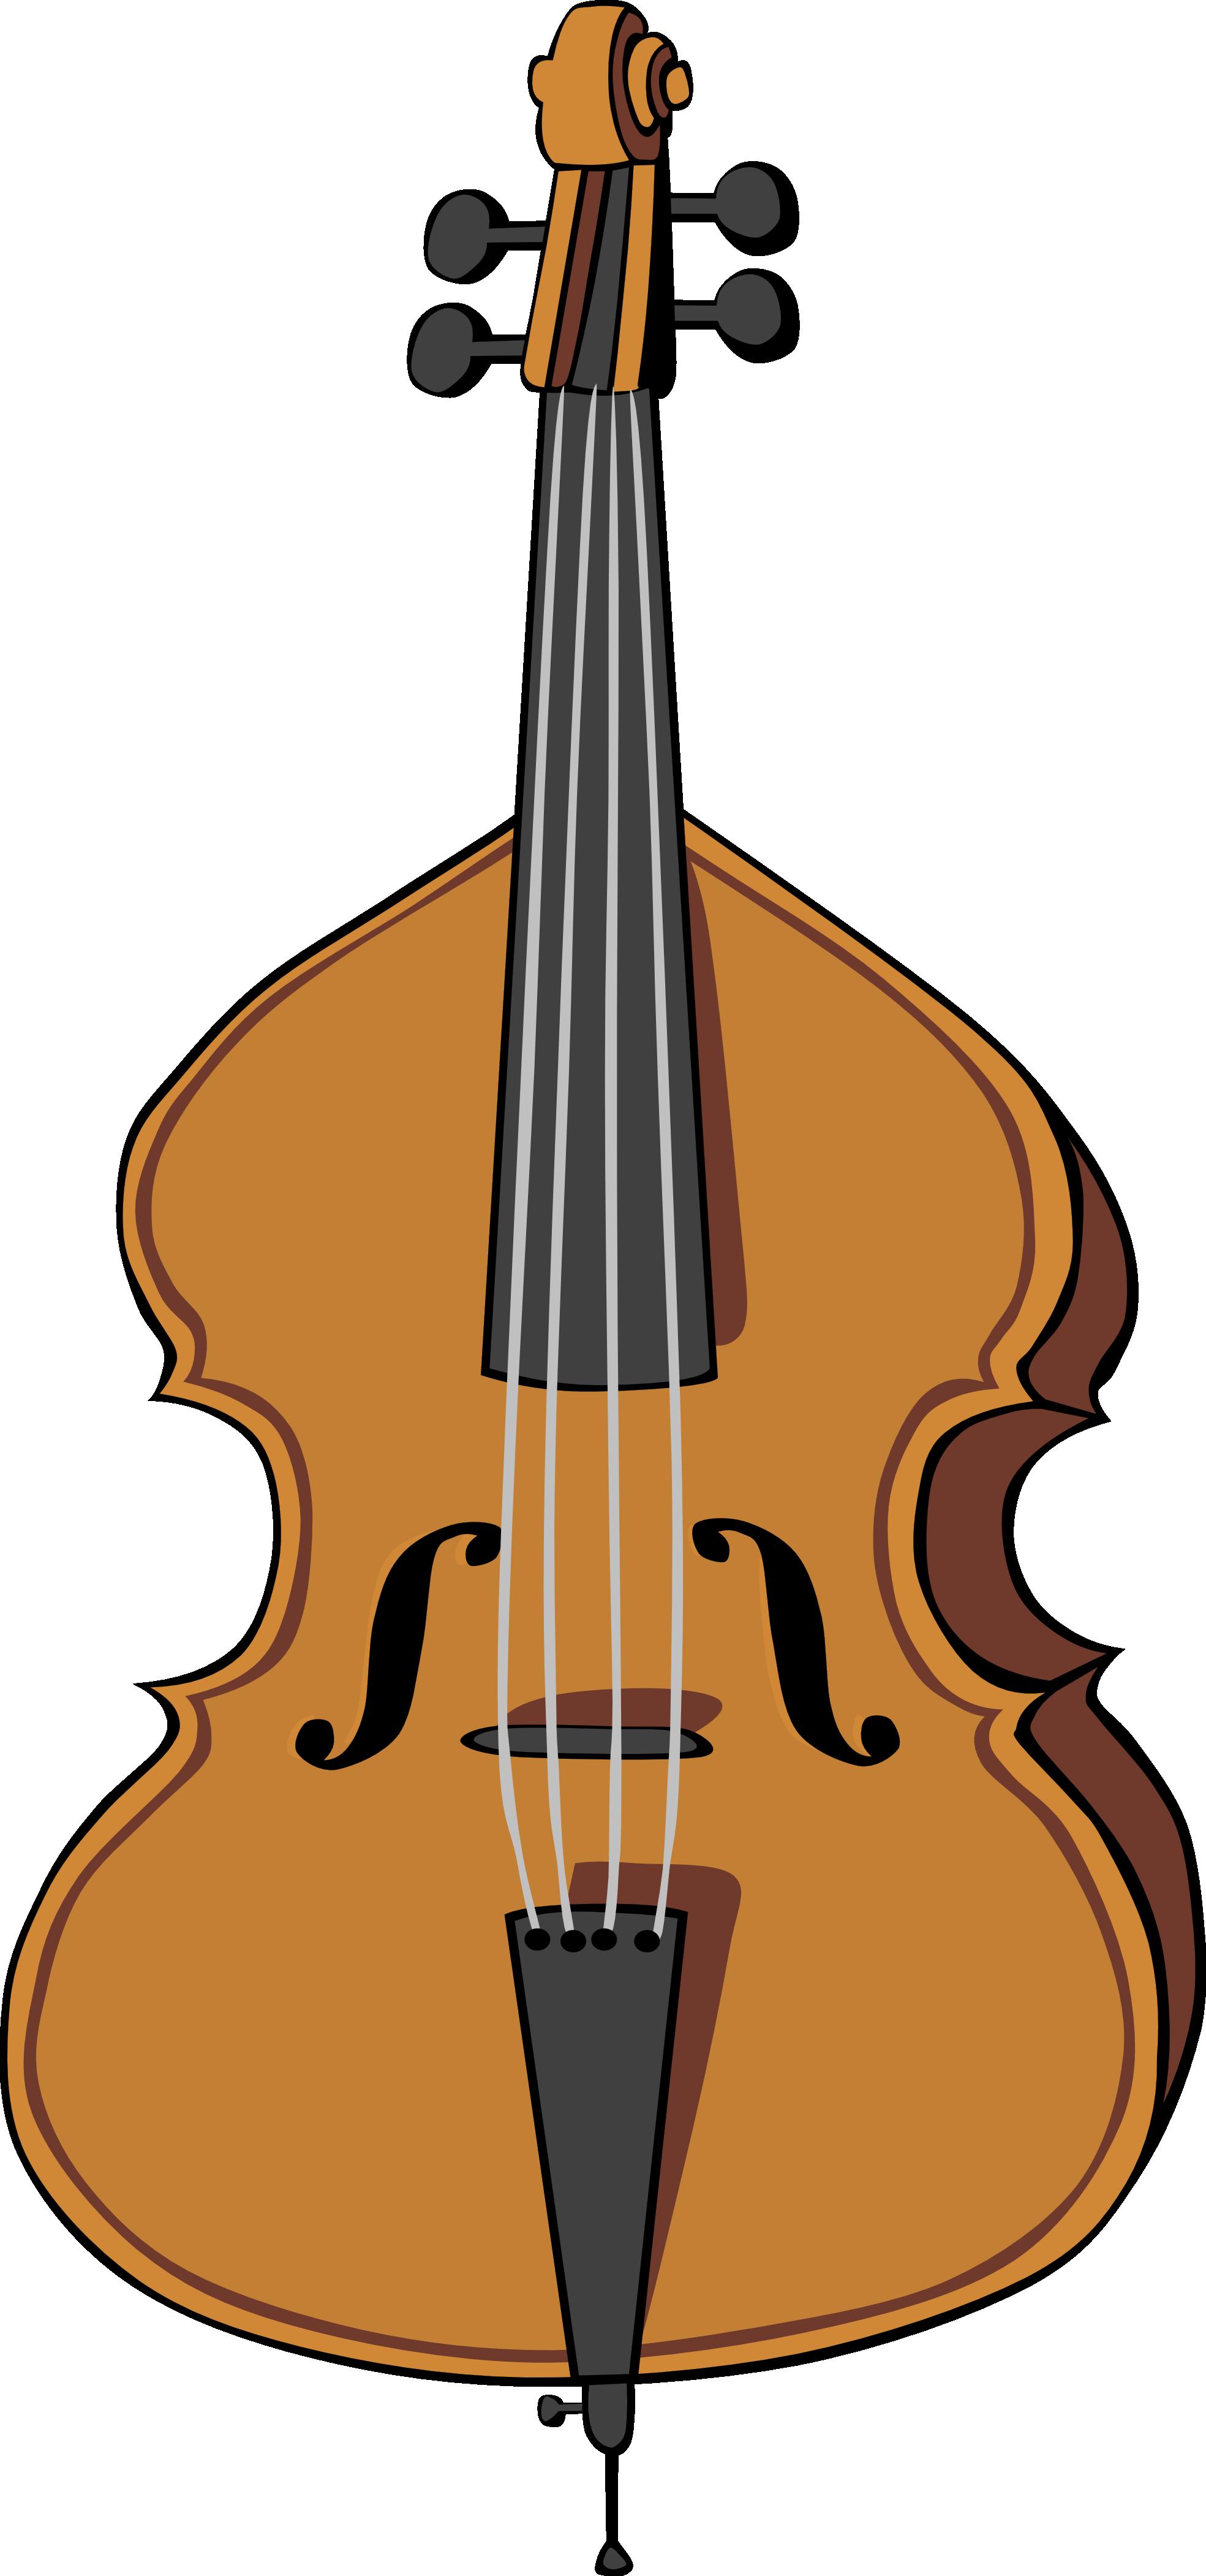 Upright bass clipart philip martin picture library stock Bass clipart upright bass, Bass upright bass Transparent ... picture library stock